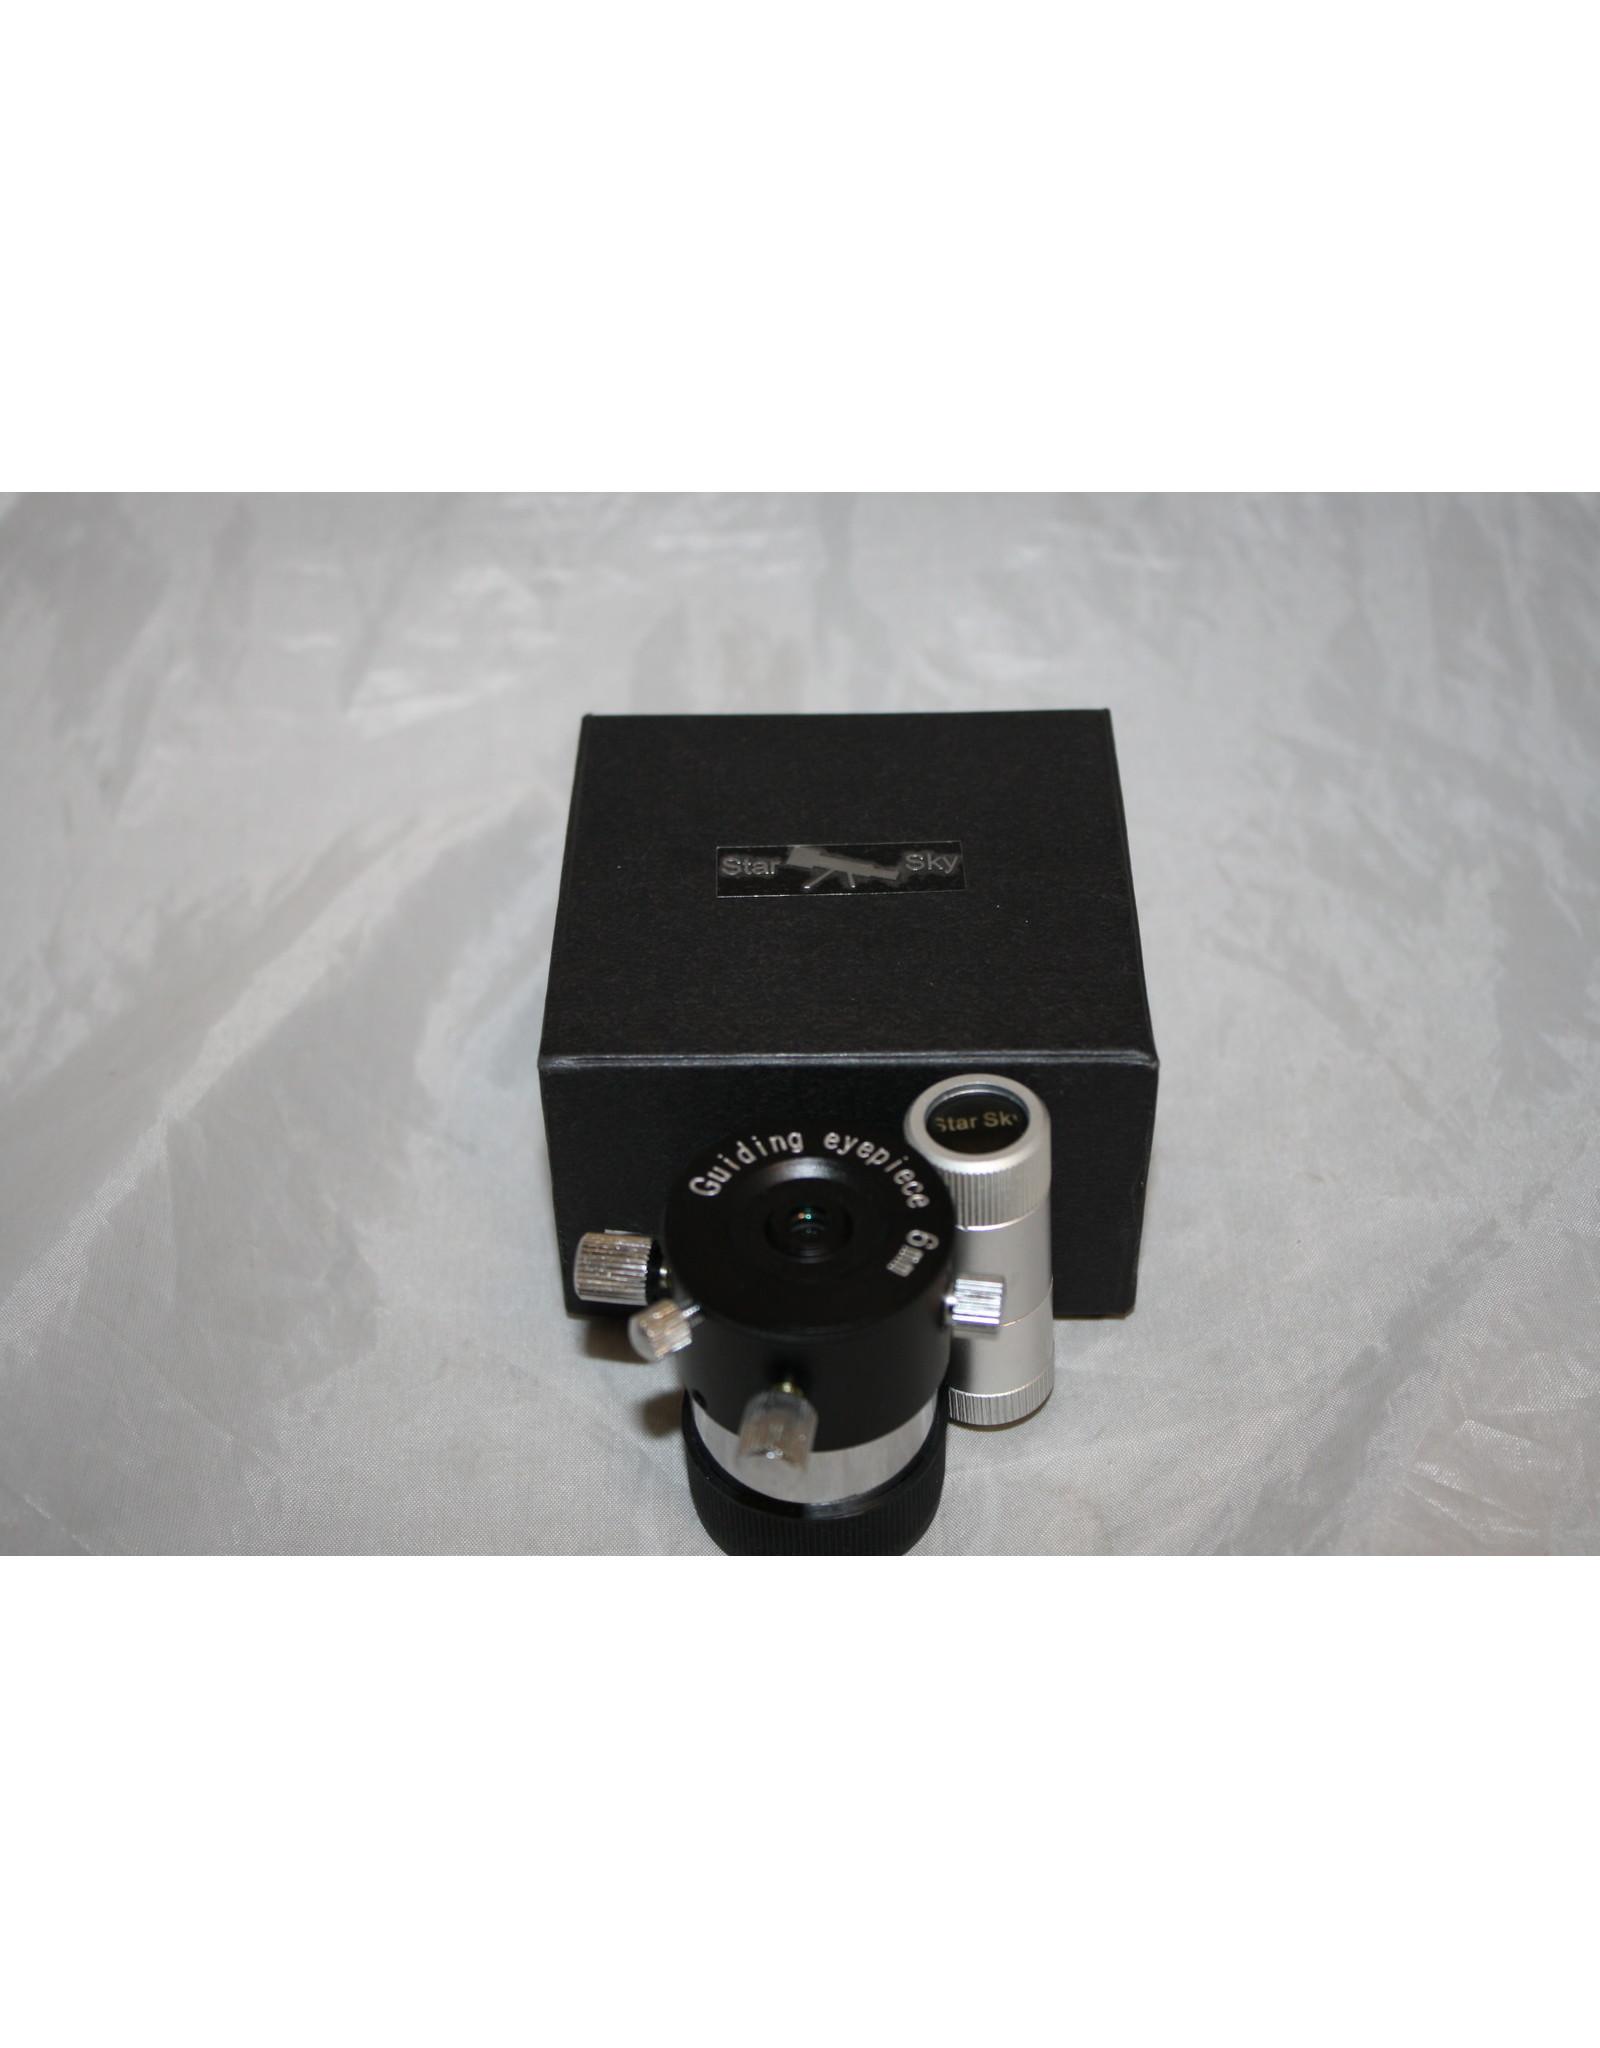 Arcturus Arcturus 6mm Focusing Reticle Eyepiece with illuminator (1.25)